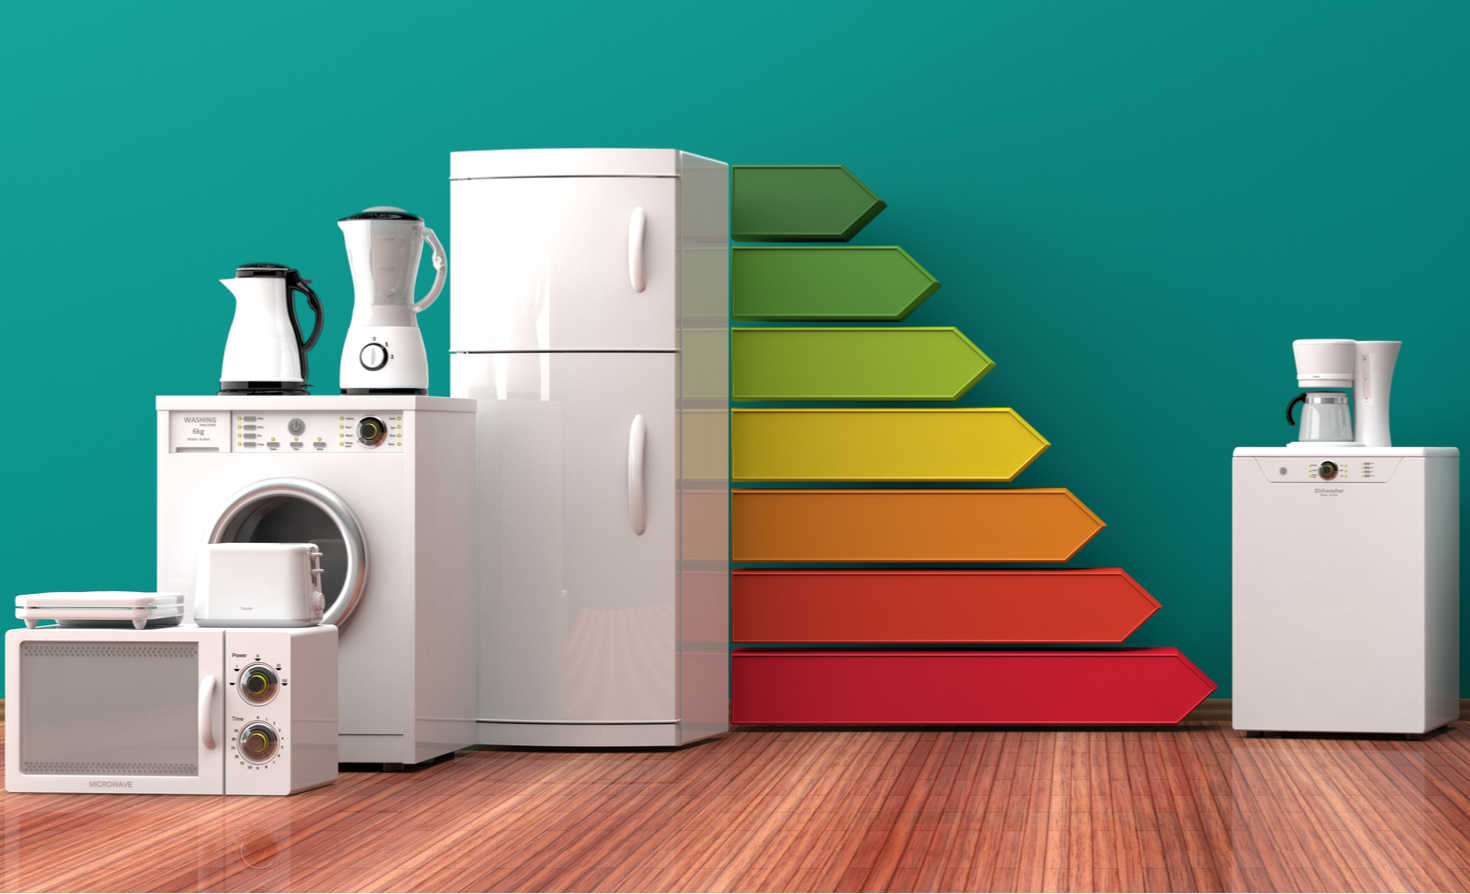 Is personalization the key to energy efficiency? | Greenbiz